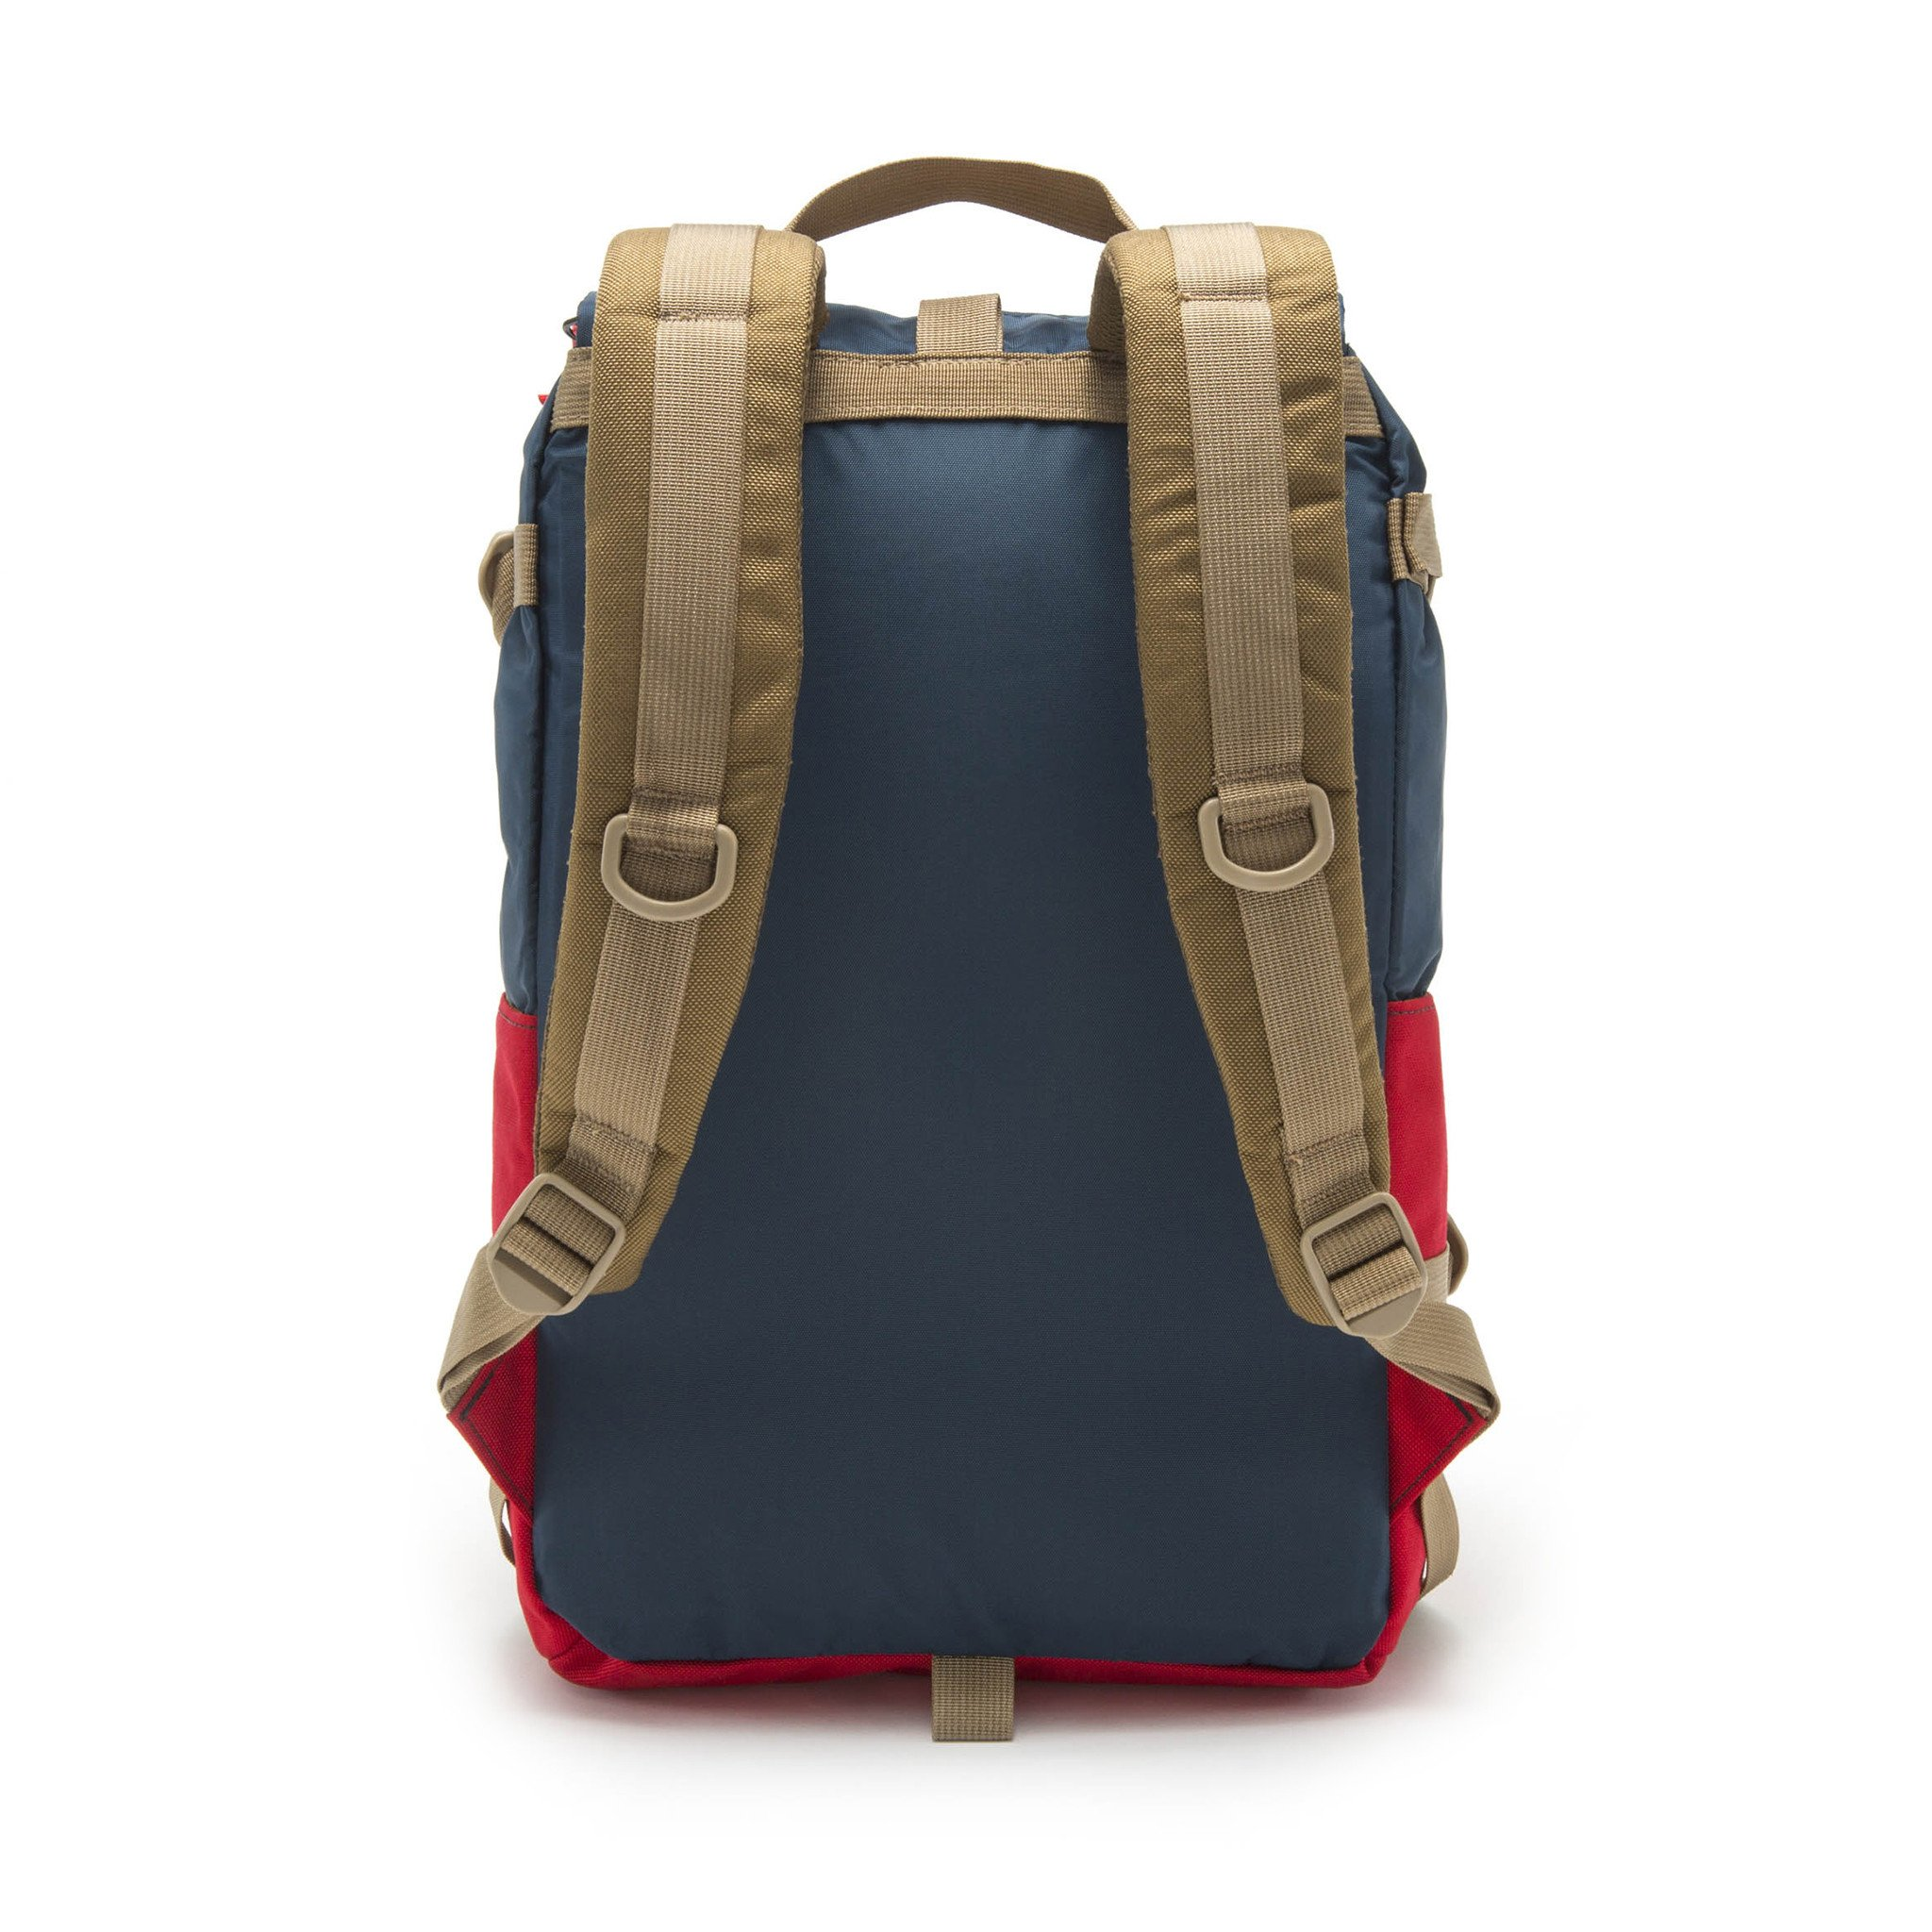 Rover Pack in 2019 | topo | Rucksack backpack, Backpacks, Cloth bags